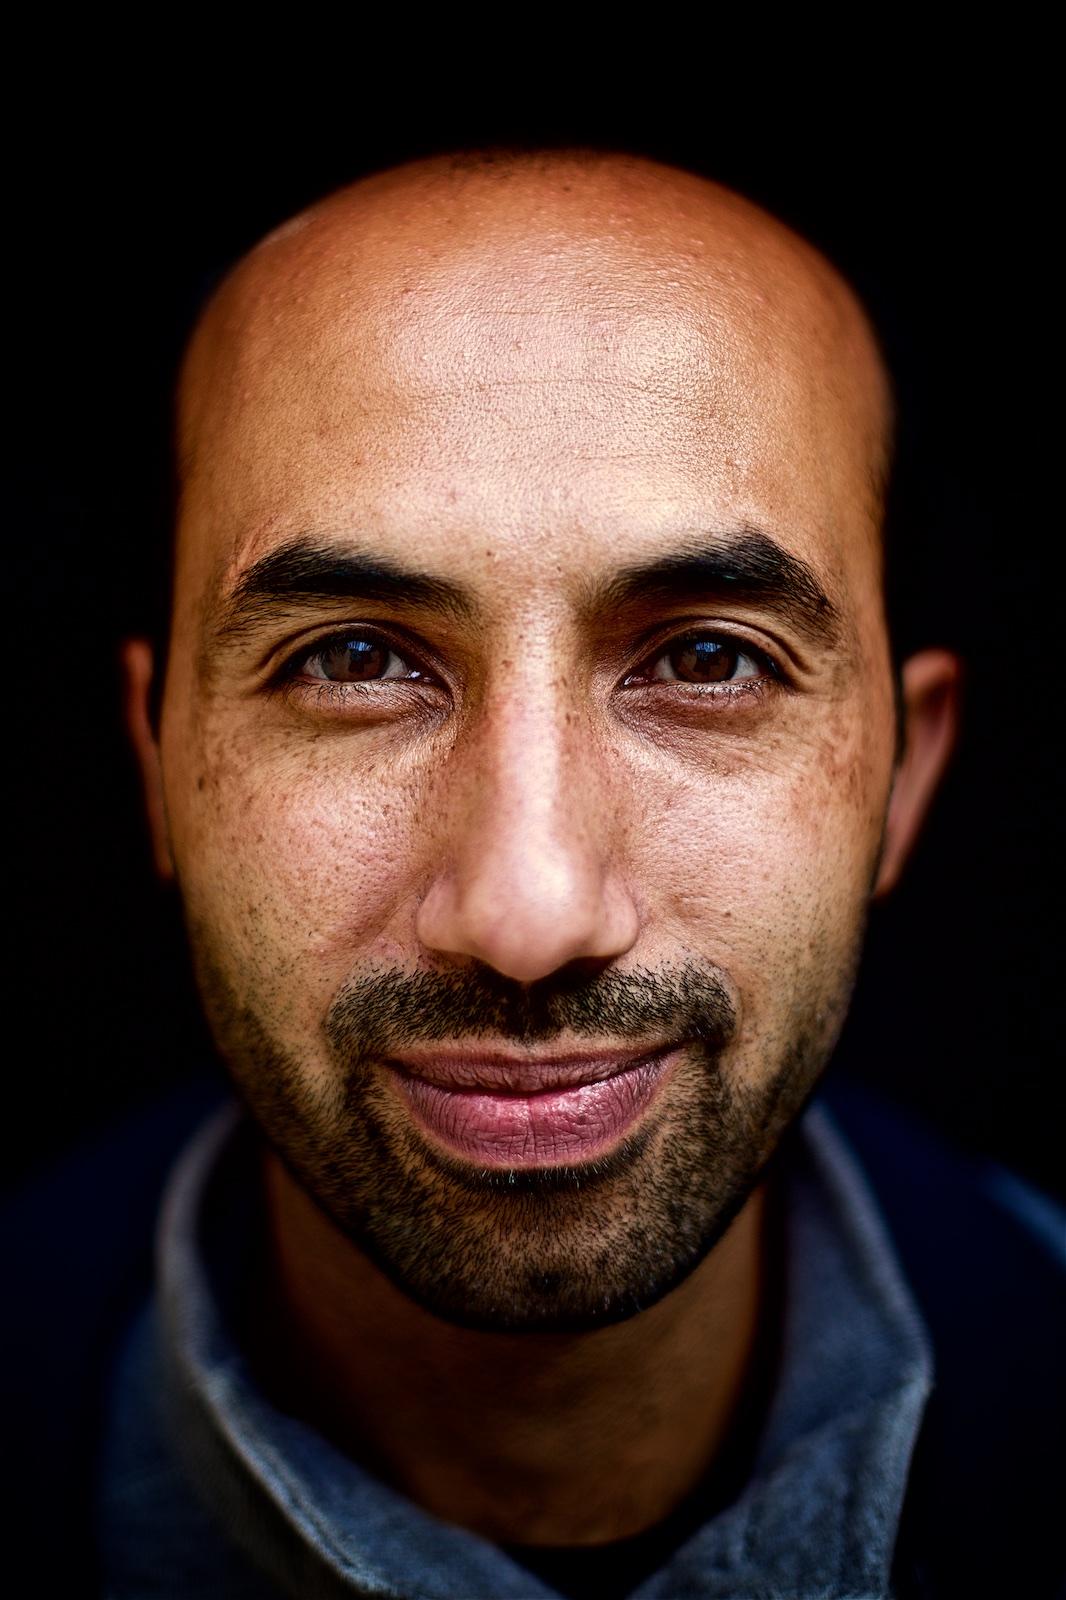 permanently-temporary-refugees-italy-rifugiati-italia-denis-bosnic-photography-portraits-1 (1).jpg